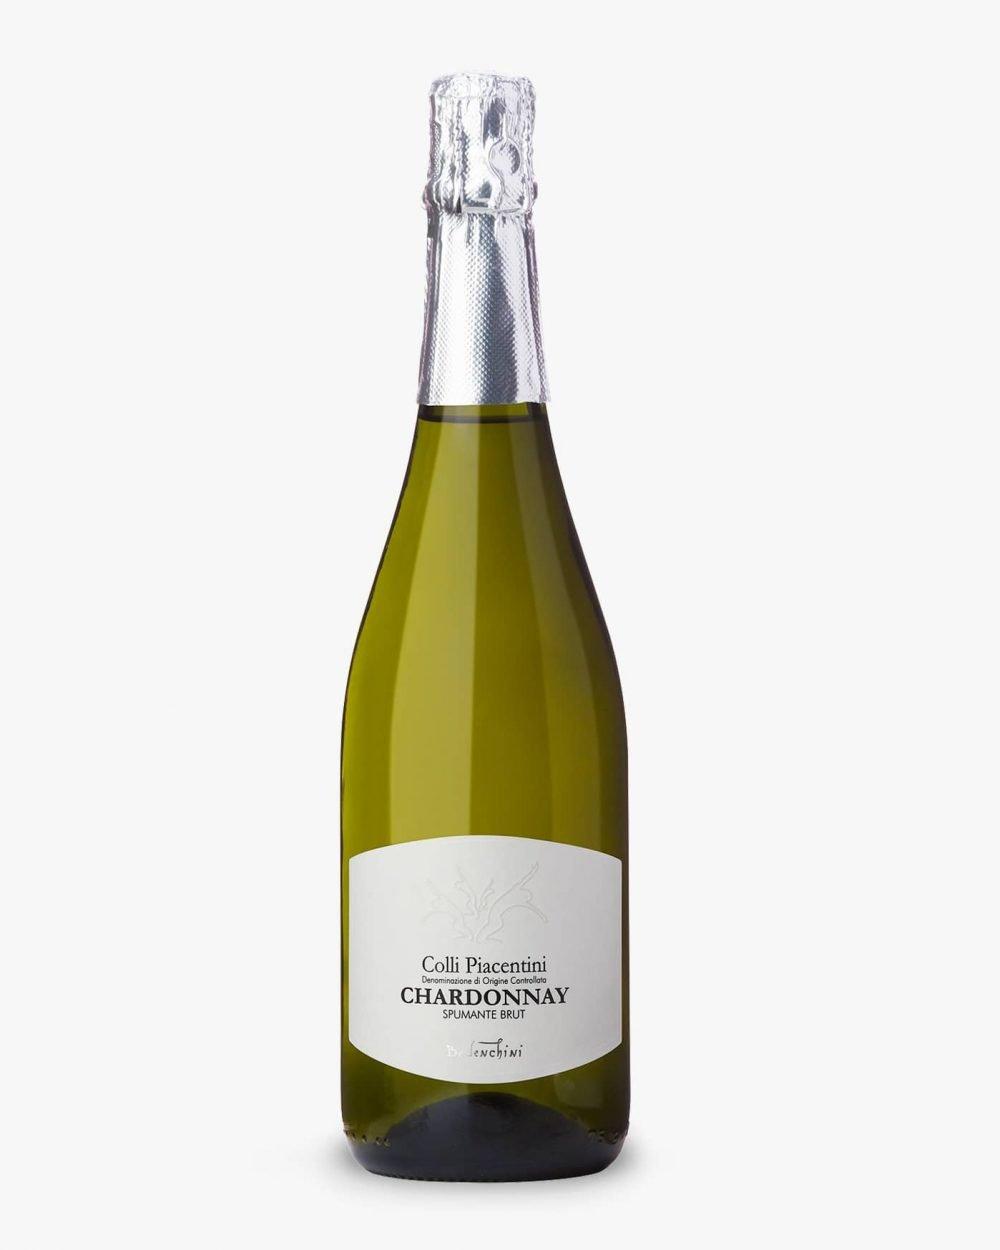 ChardonnaySpumanteColliPiacentiniDOC - Badenchini